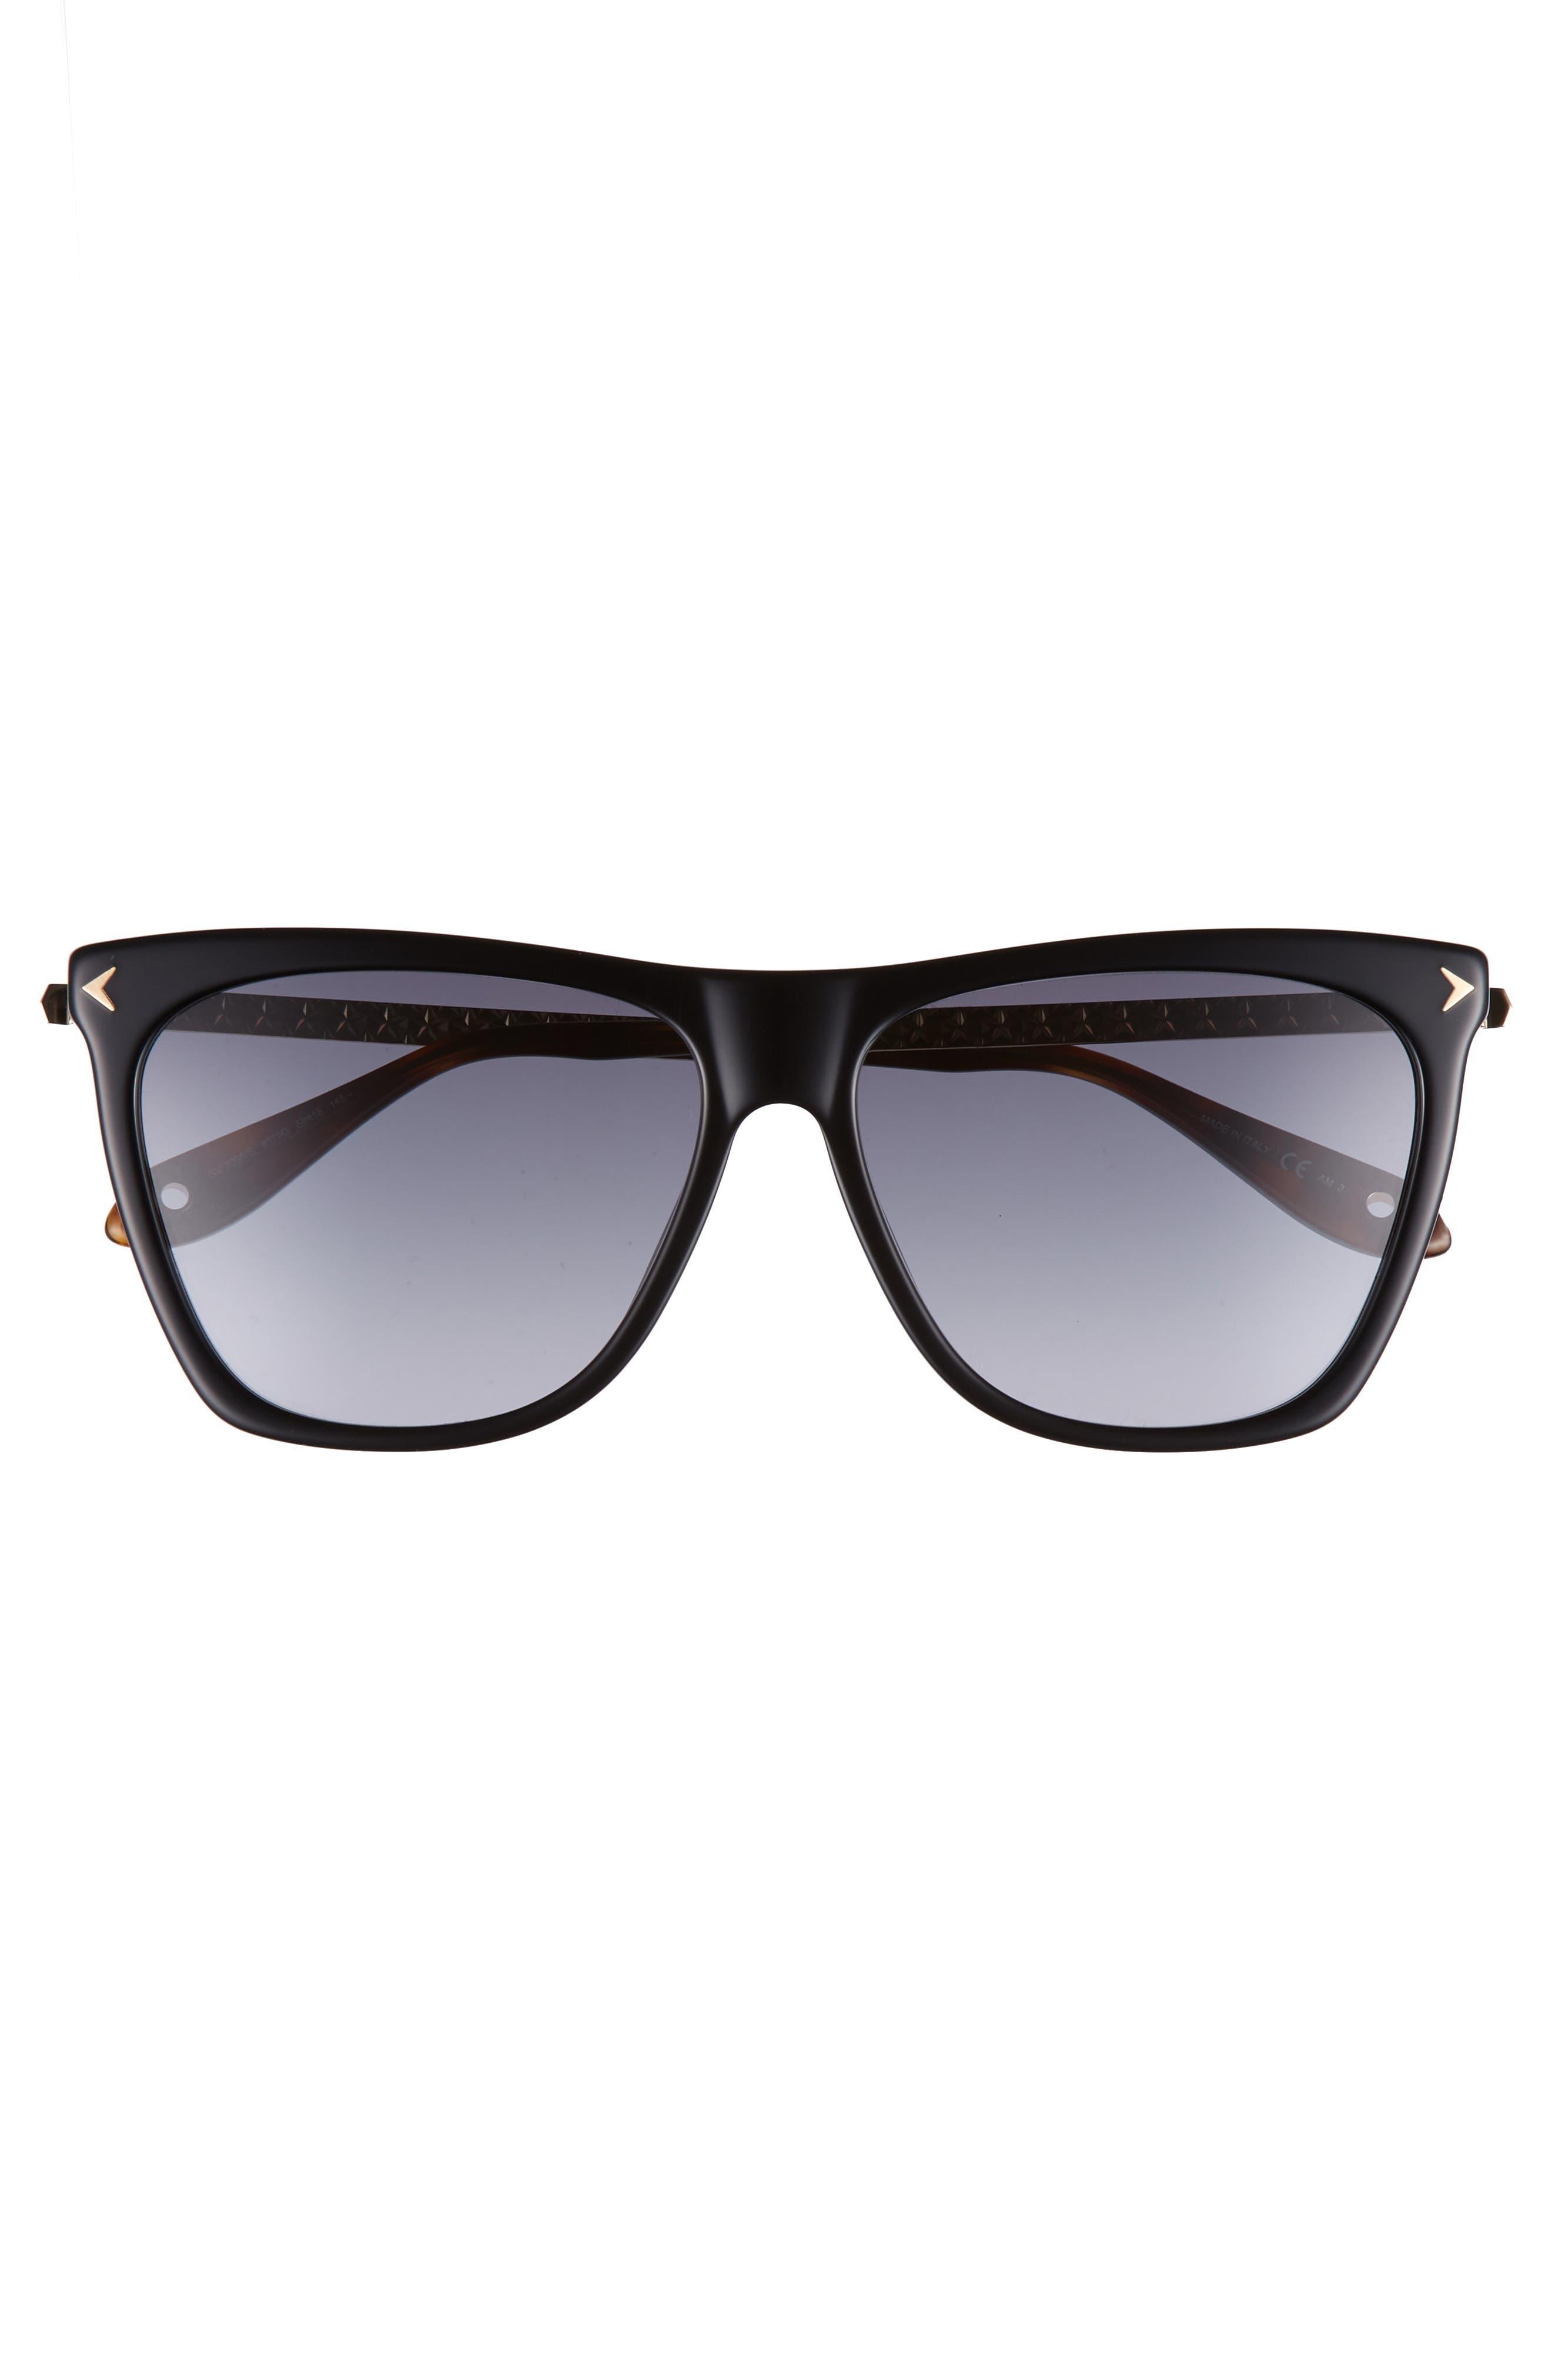 58mm Flat Top Sunglasses,                             Alternate thumbnail 3, color,                             BLACK